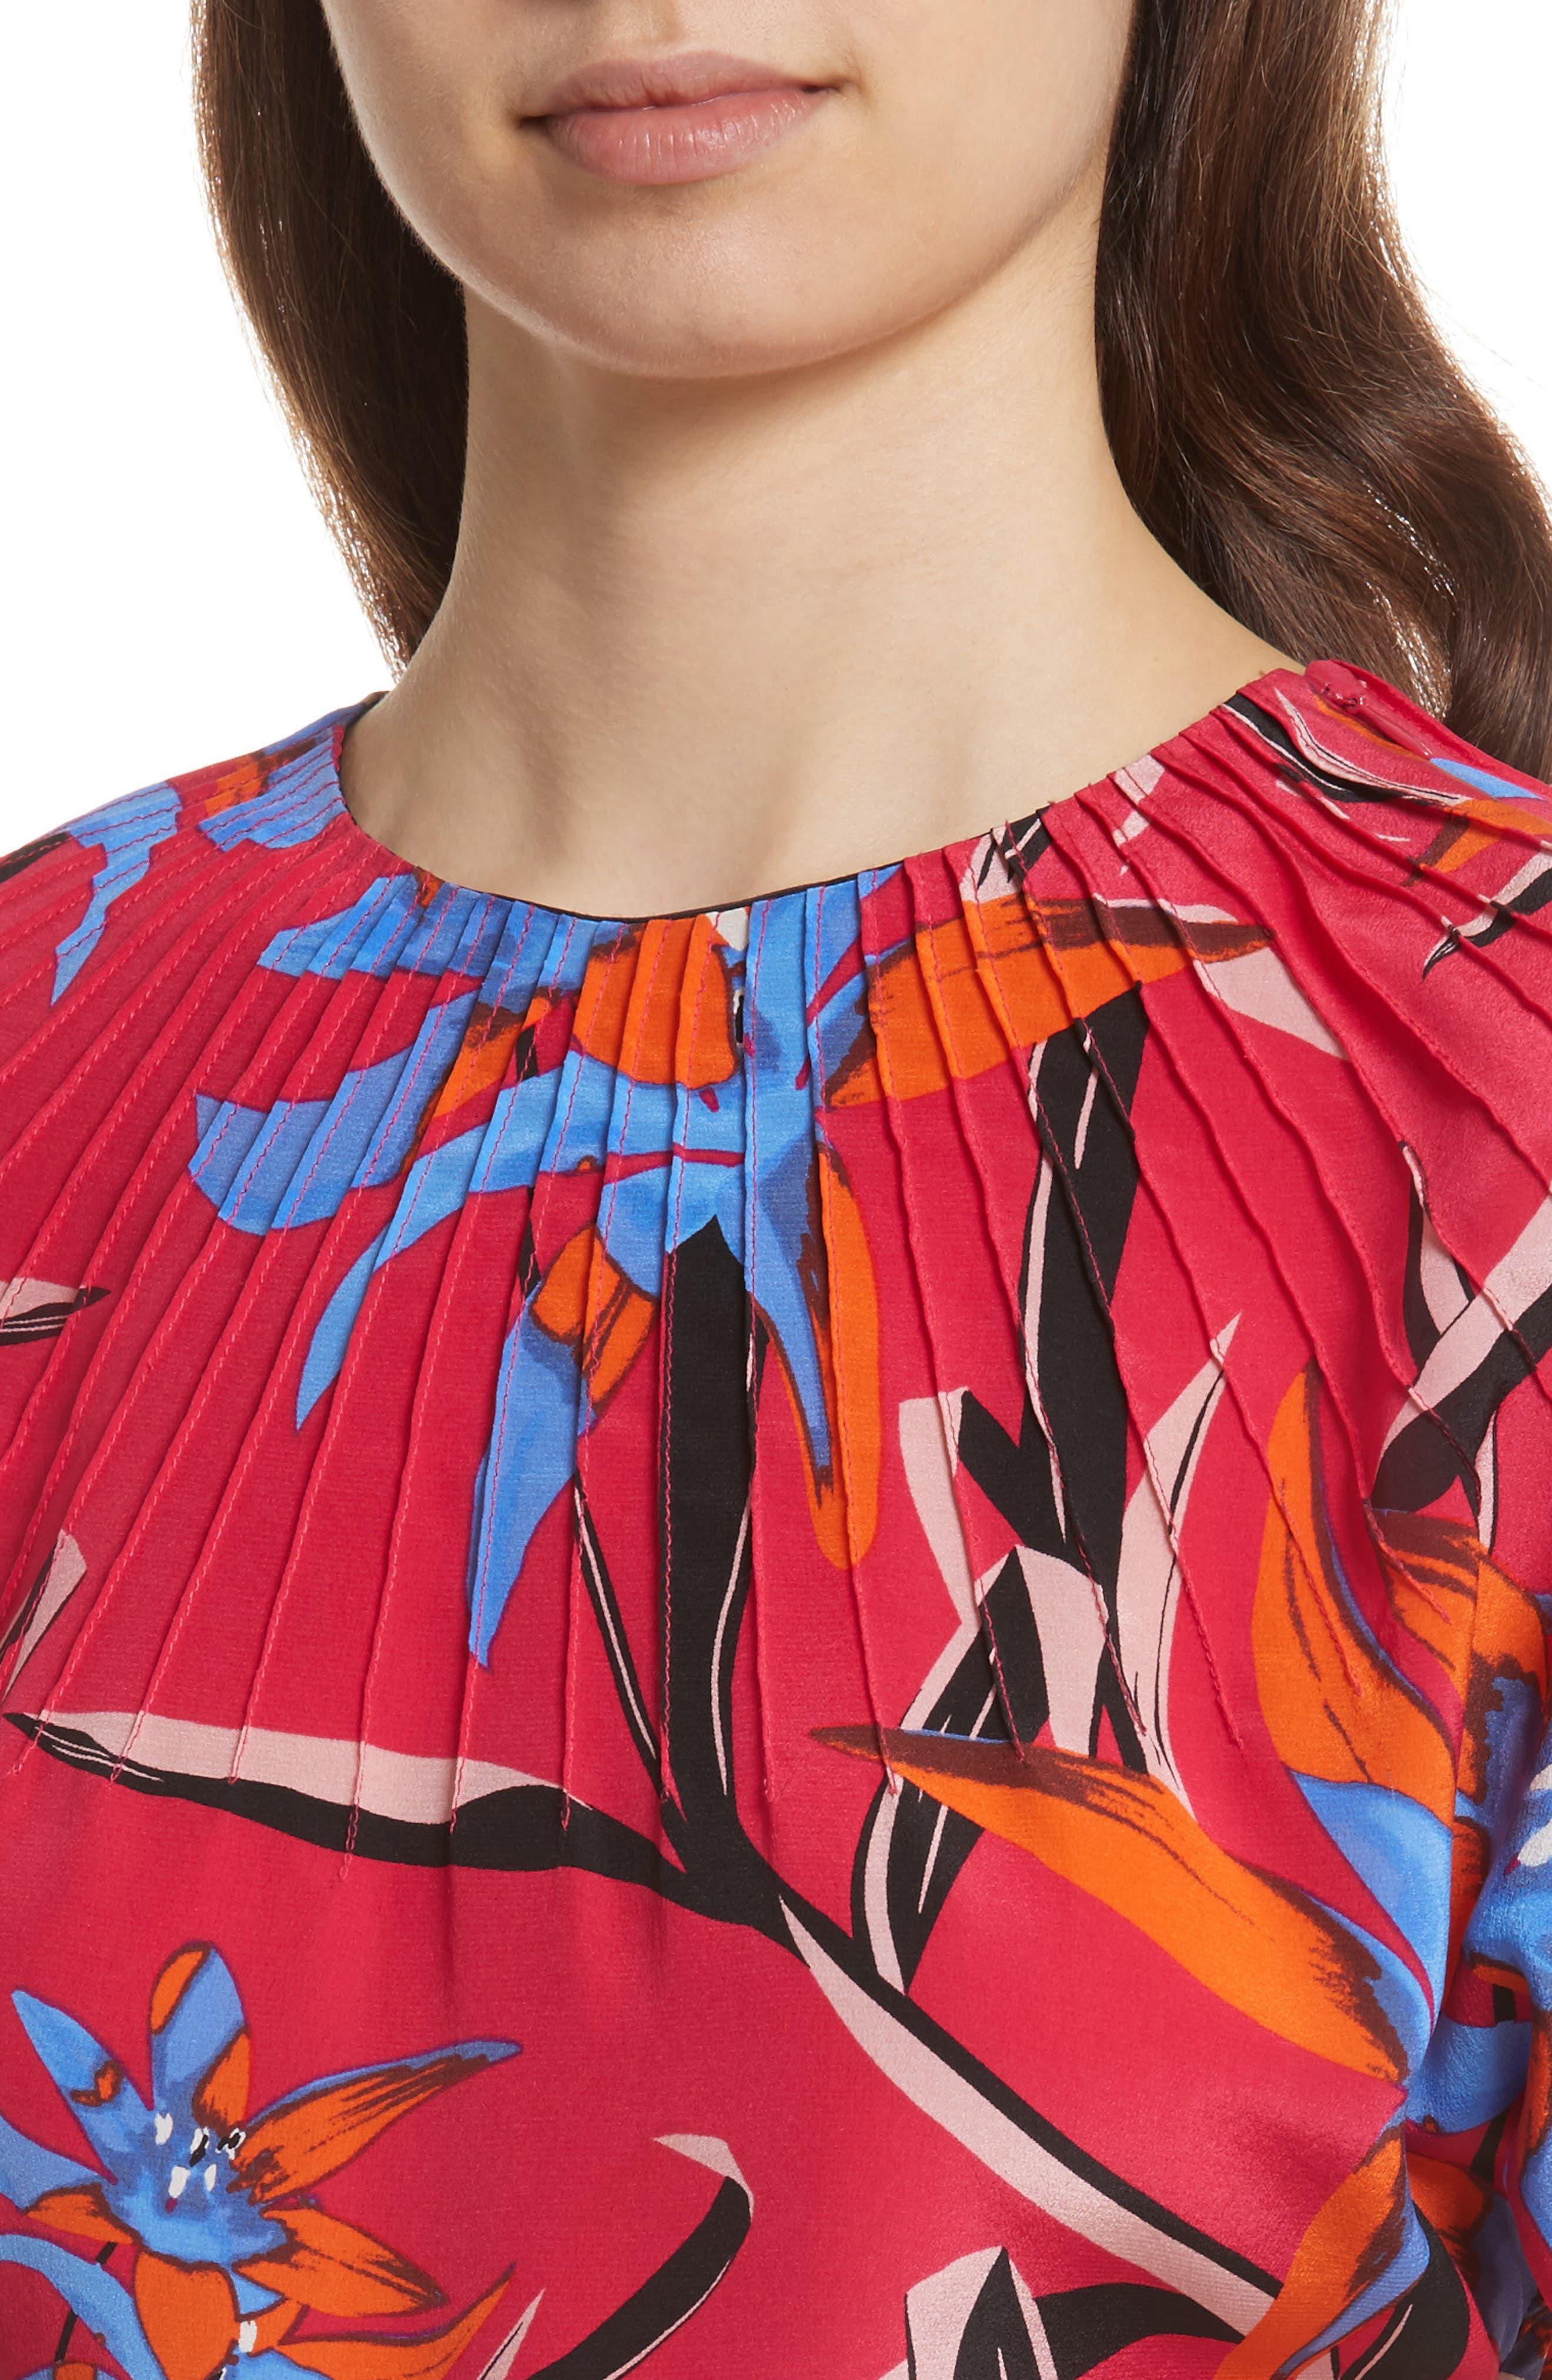 Diane von Furstenberg Pintuck Print Silk Crop Top,                             Alternate thumbnail 4, color,                             Harlow Magenta